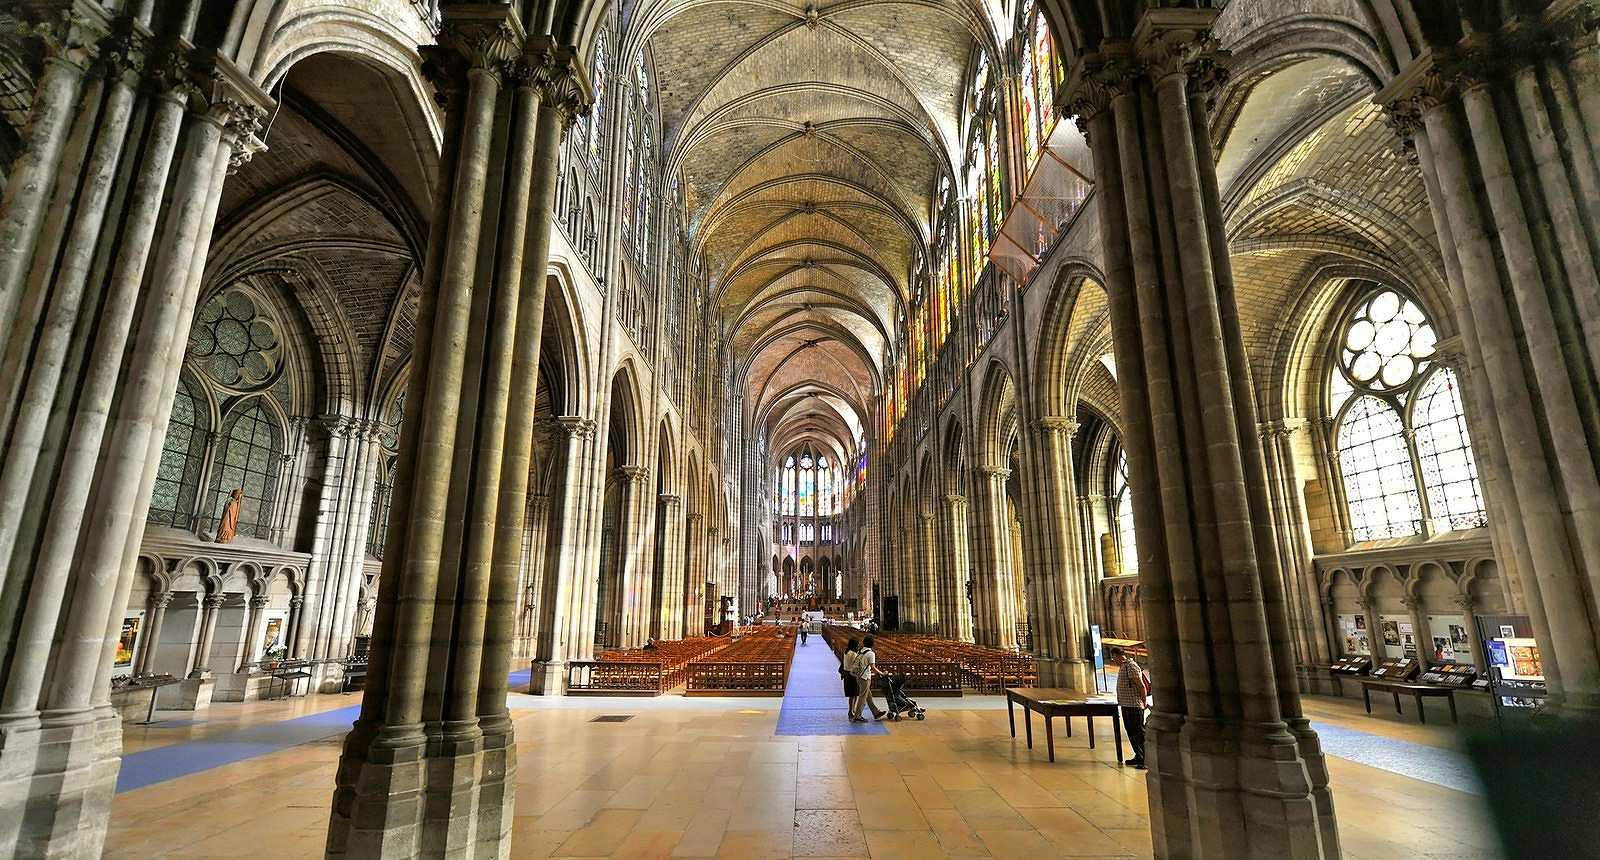 L'abbaye bénédictine de Saint-Denis